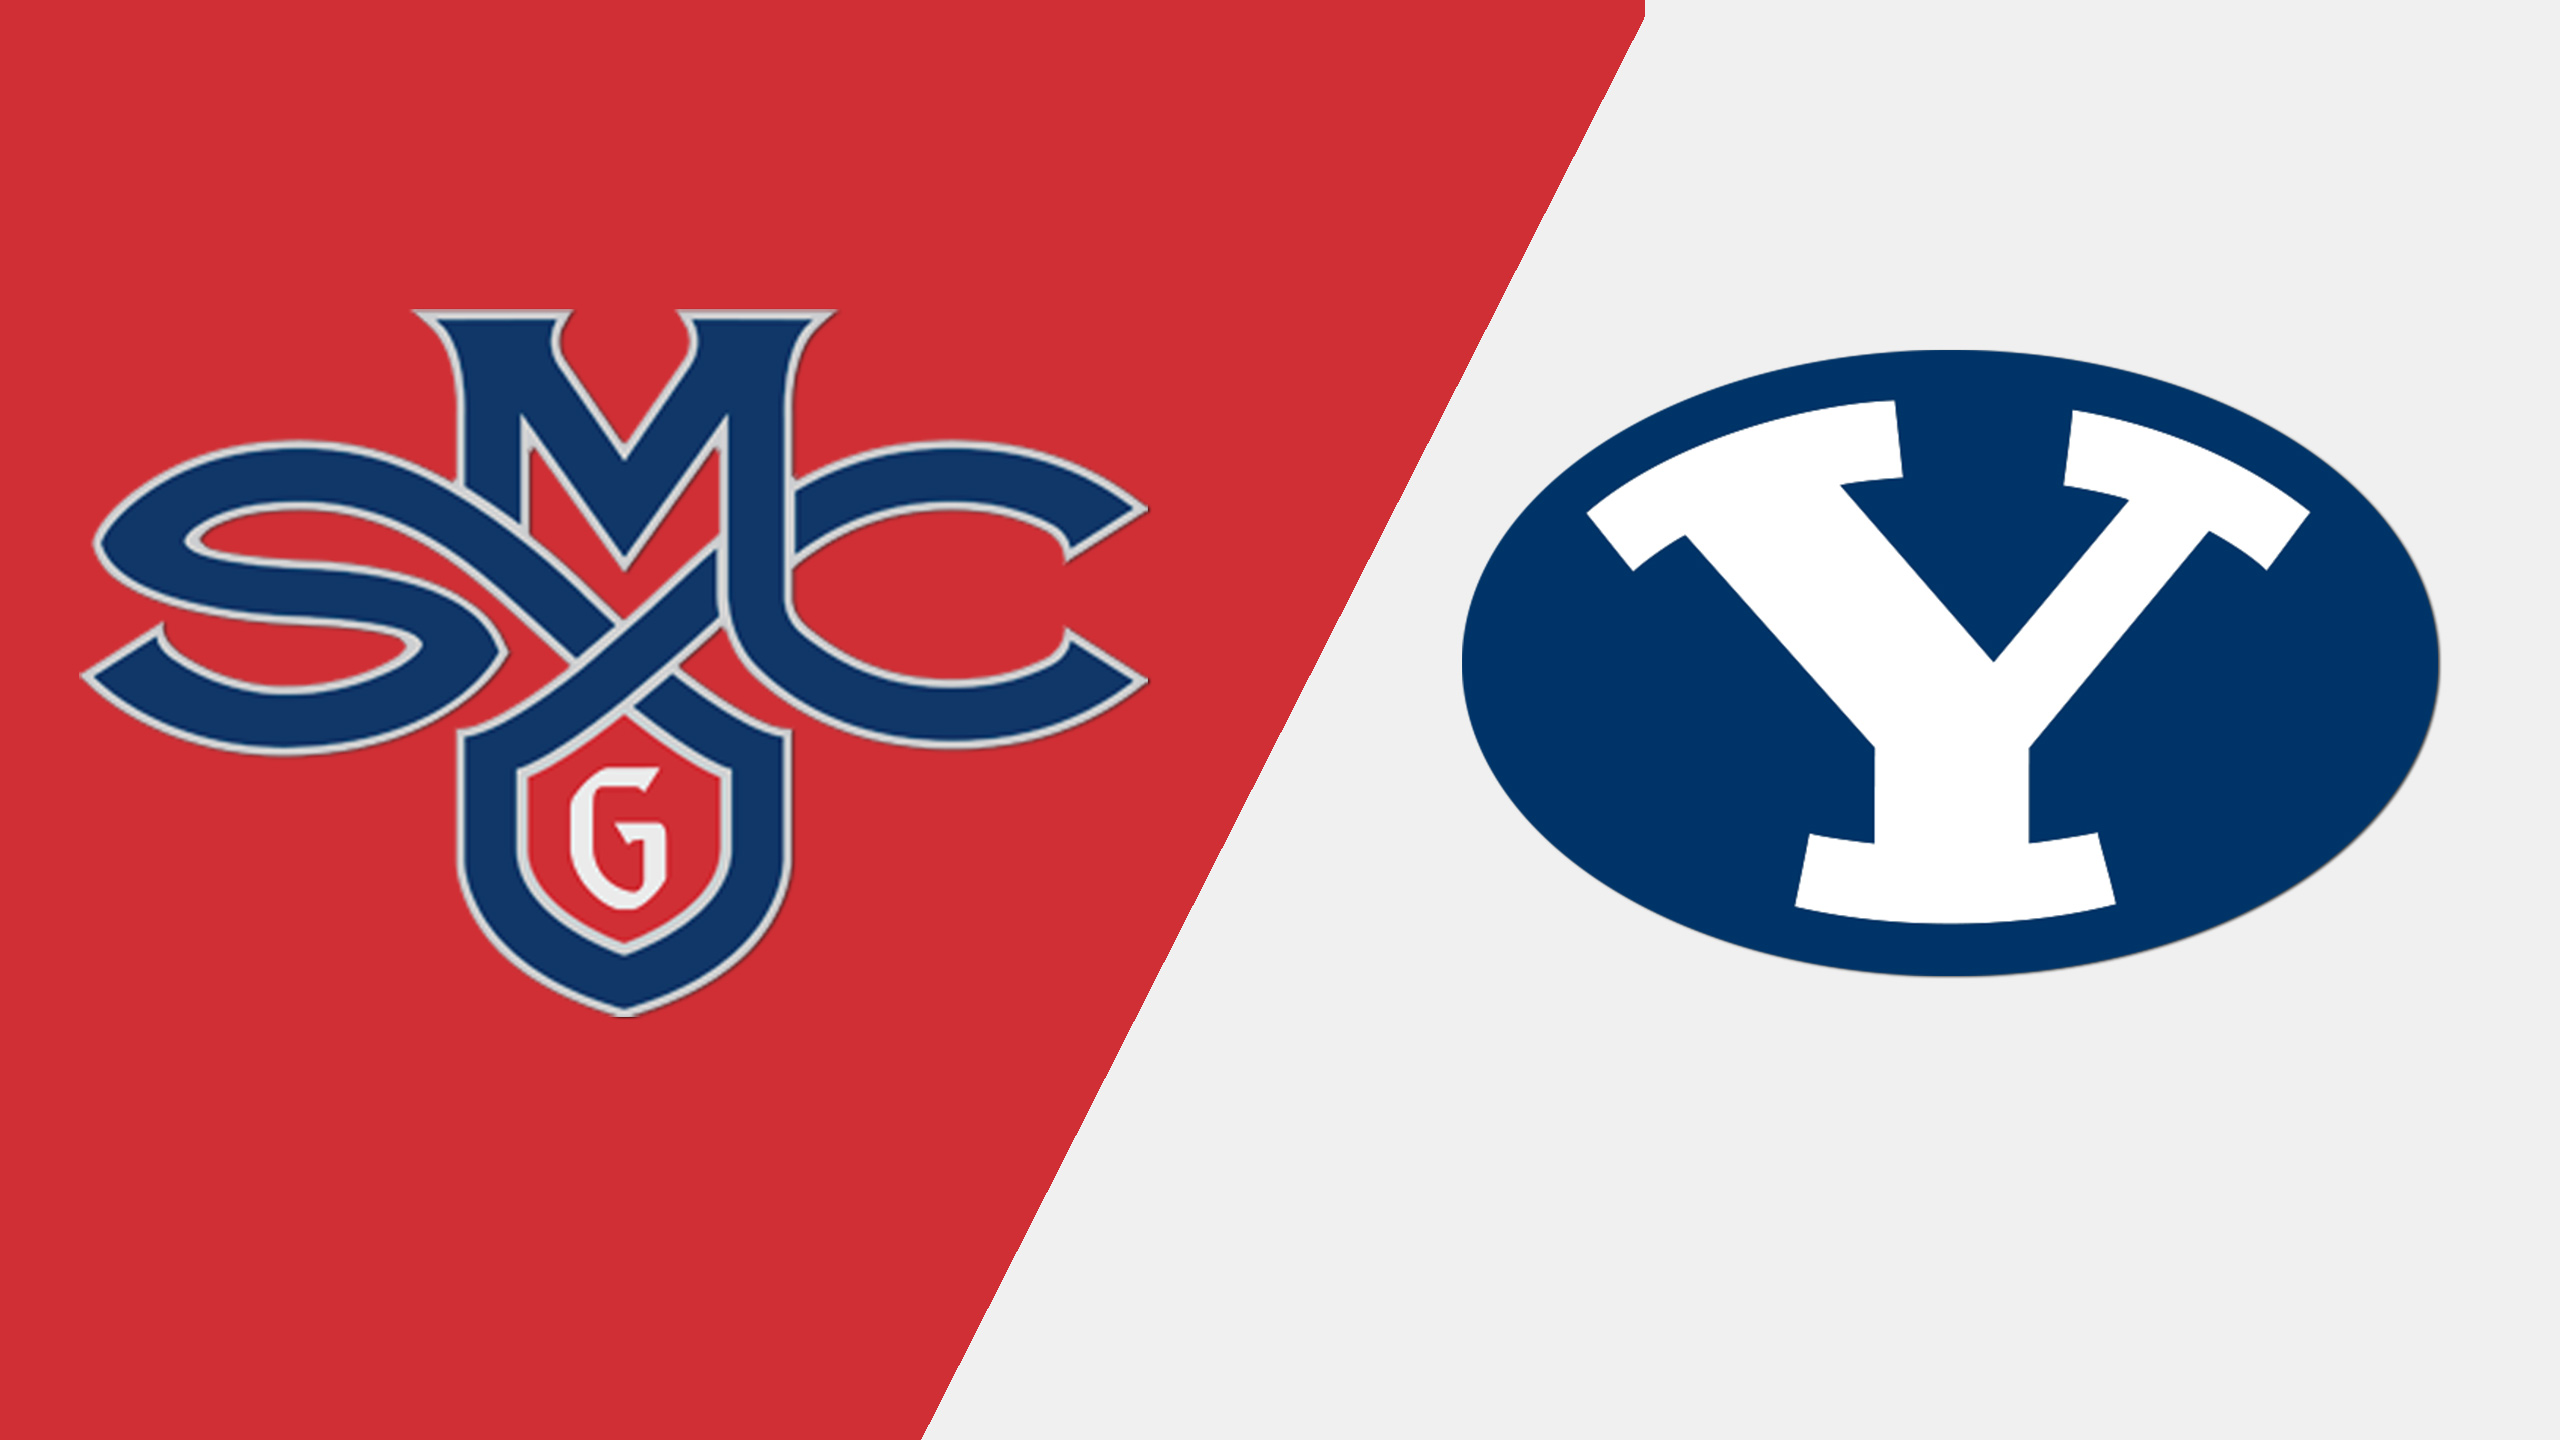 Saint Mary's vs. BYU (M Basketball) (re-air)